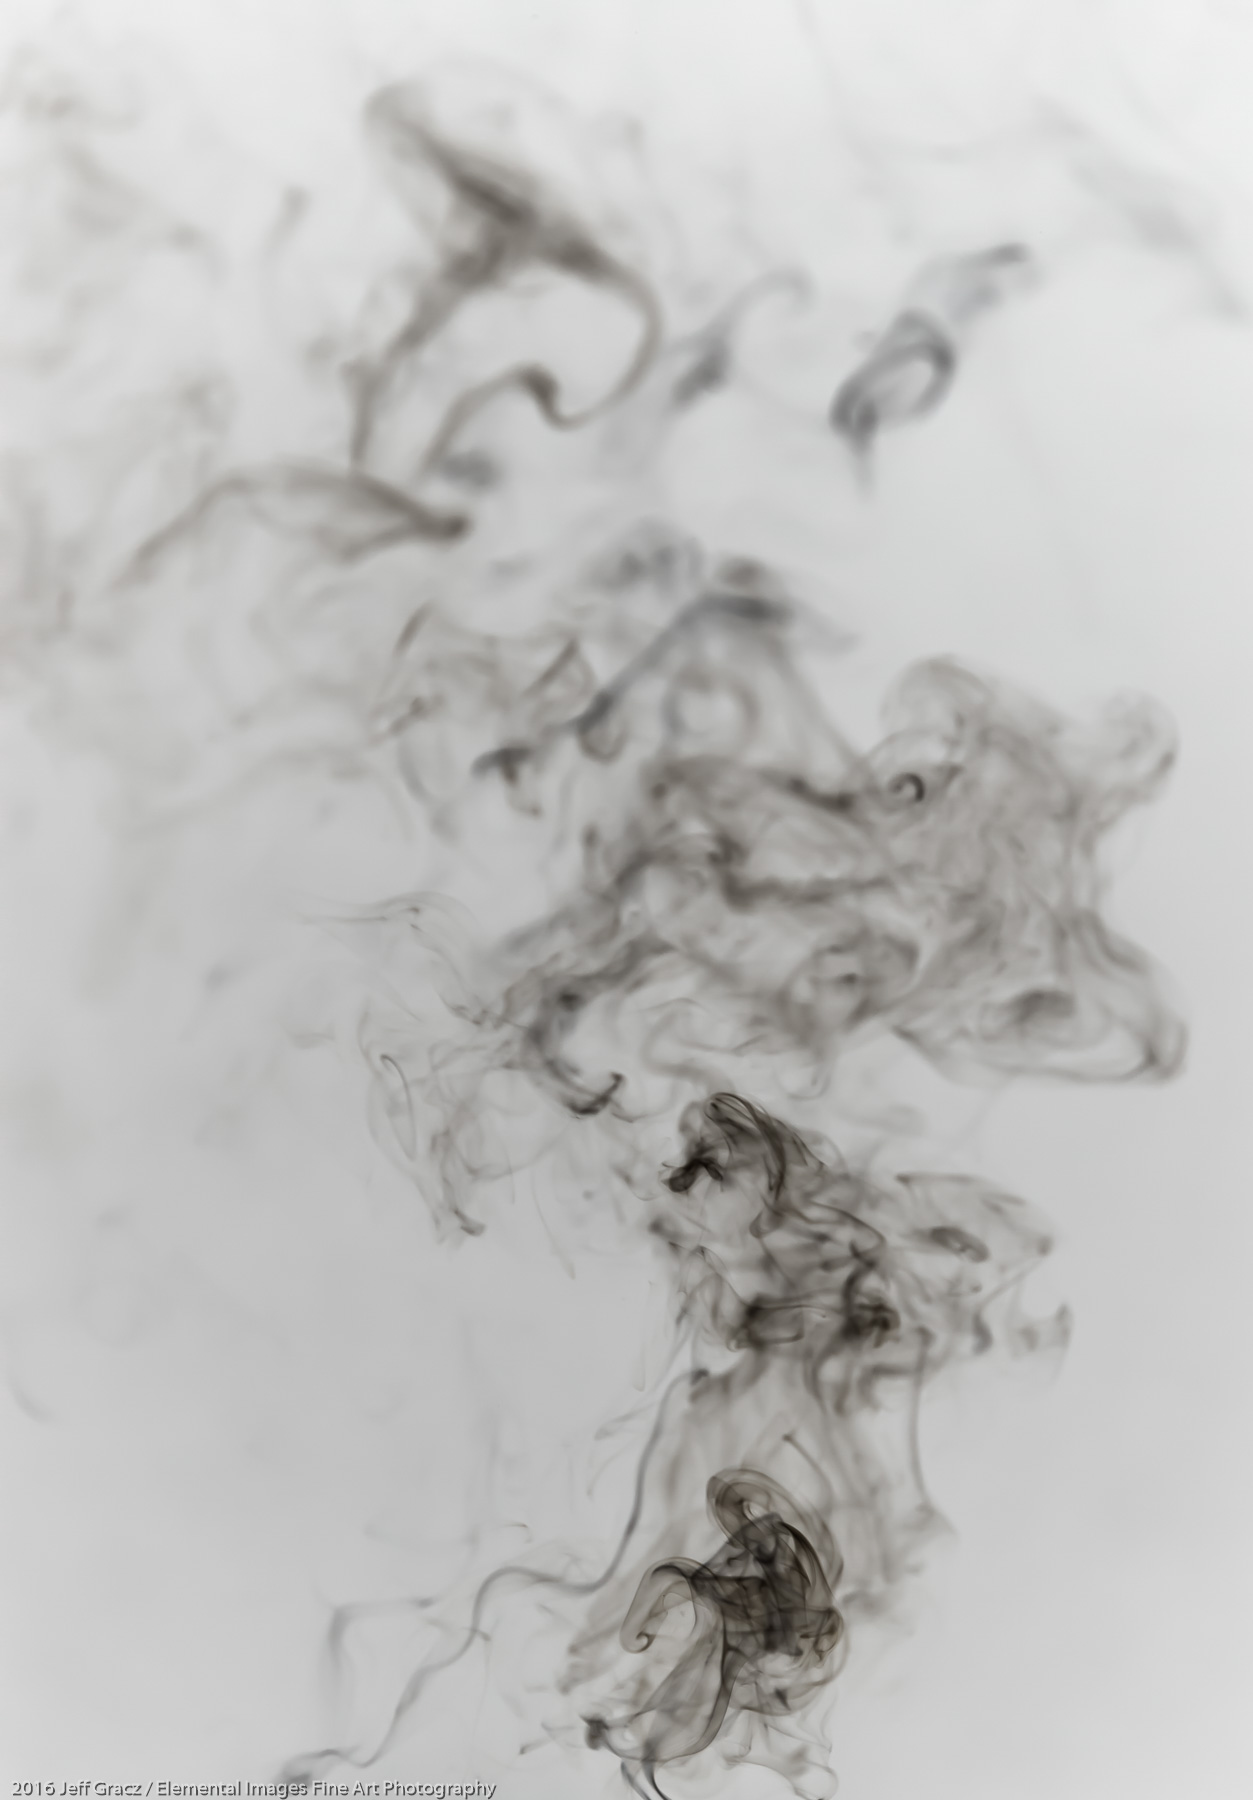 Smoke 13 | Vancouver | WA | USA - © 2016 Jeff Gracz / Elemental Images Fine Art Photography - All Rights Reserved Worldwide